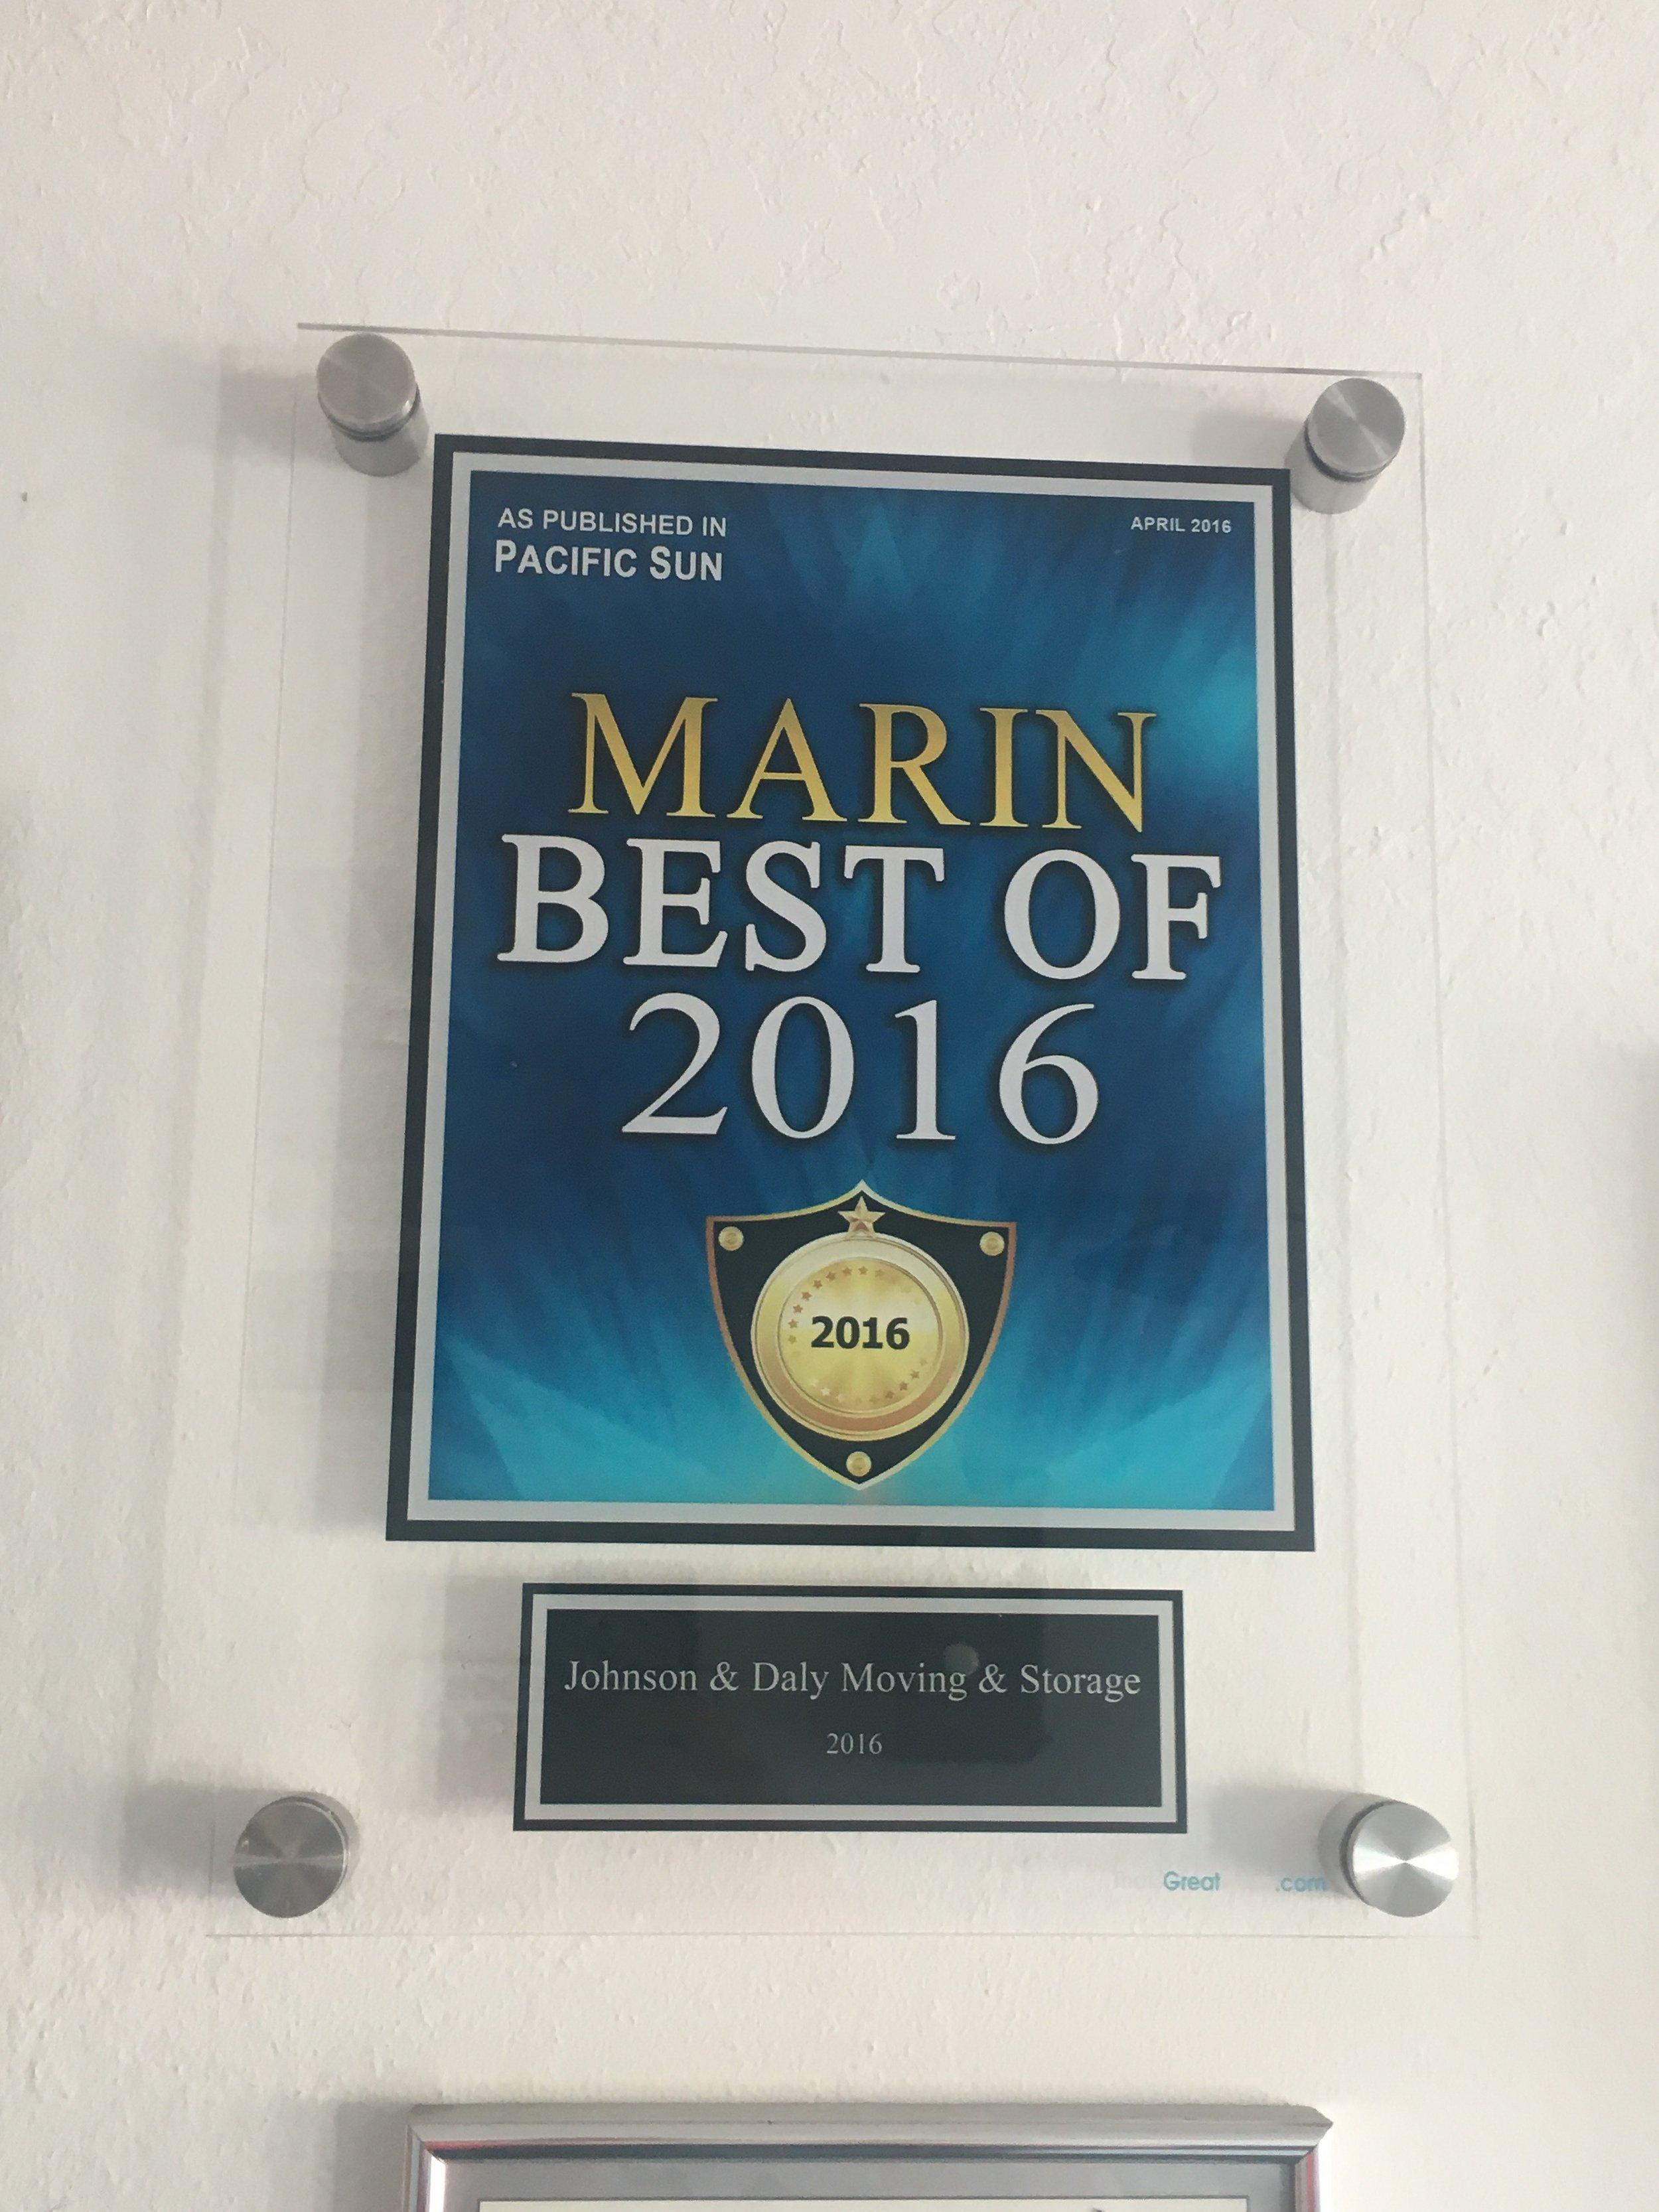 best of marin 2016